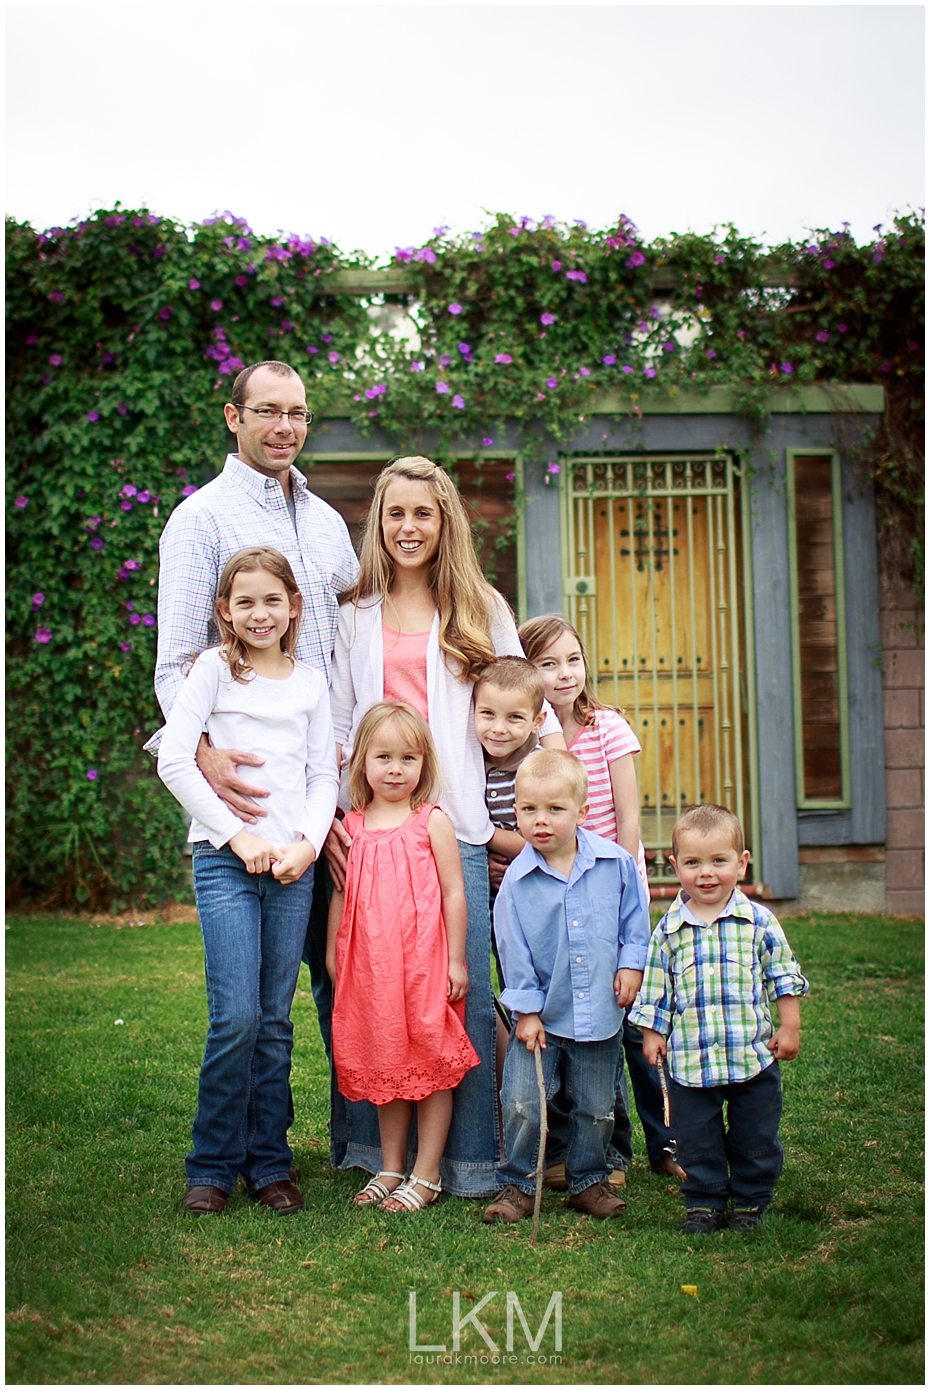 upland-family-portrait-photographer-mikat_0025.jpg